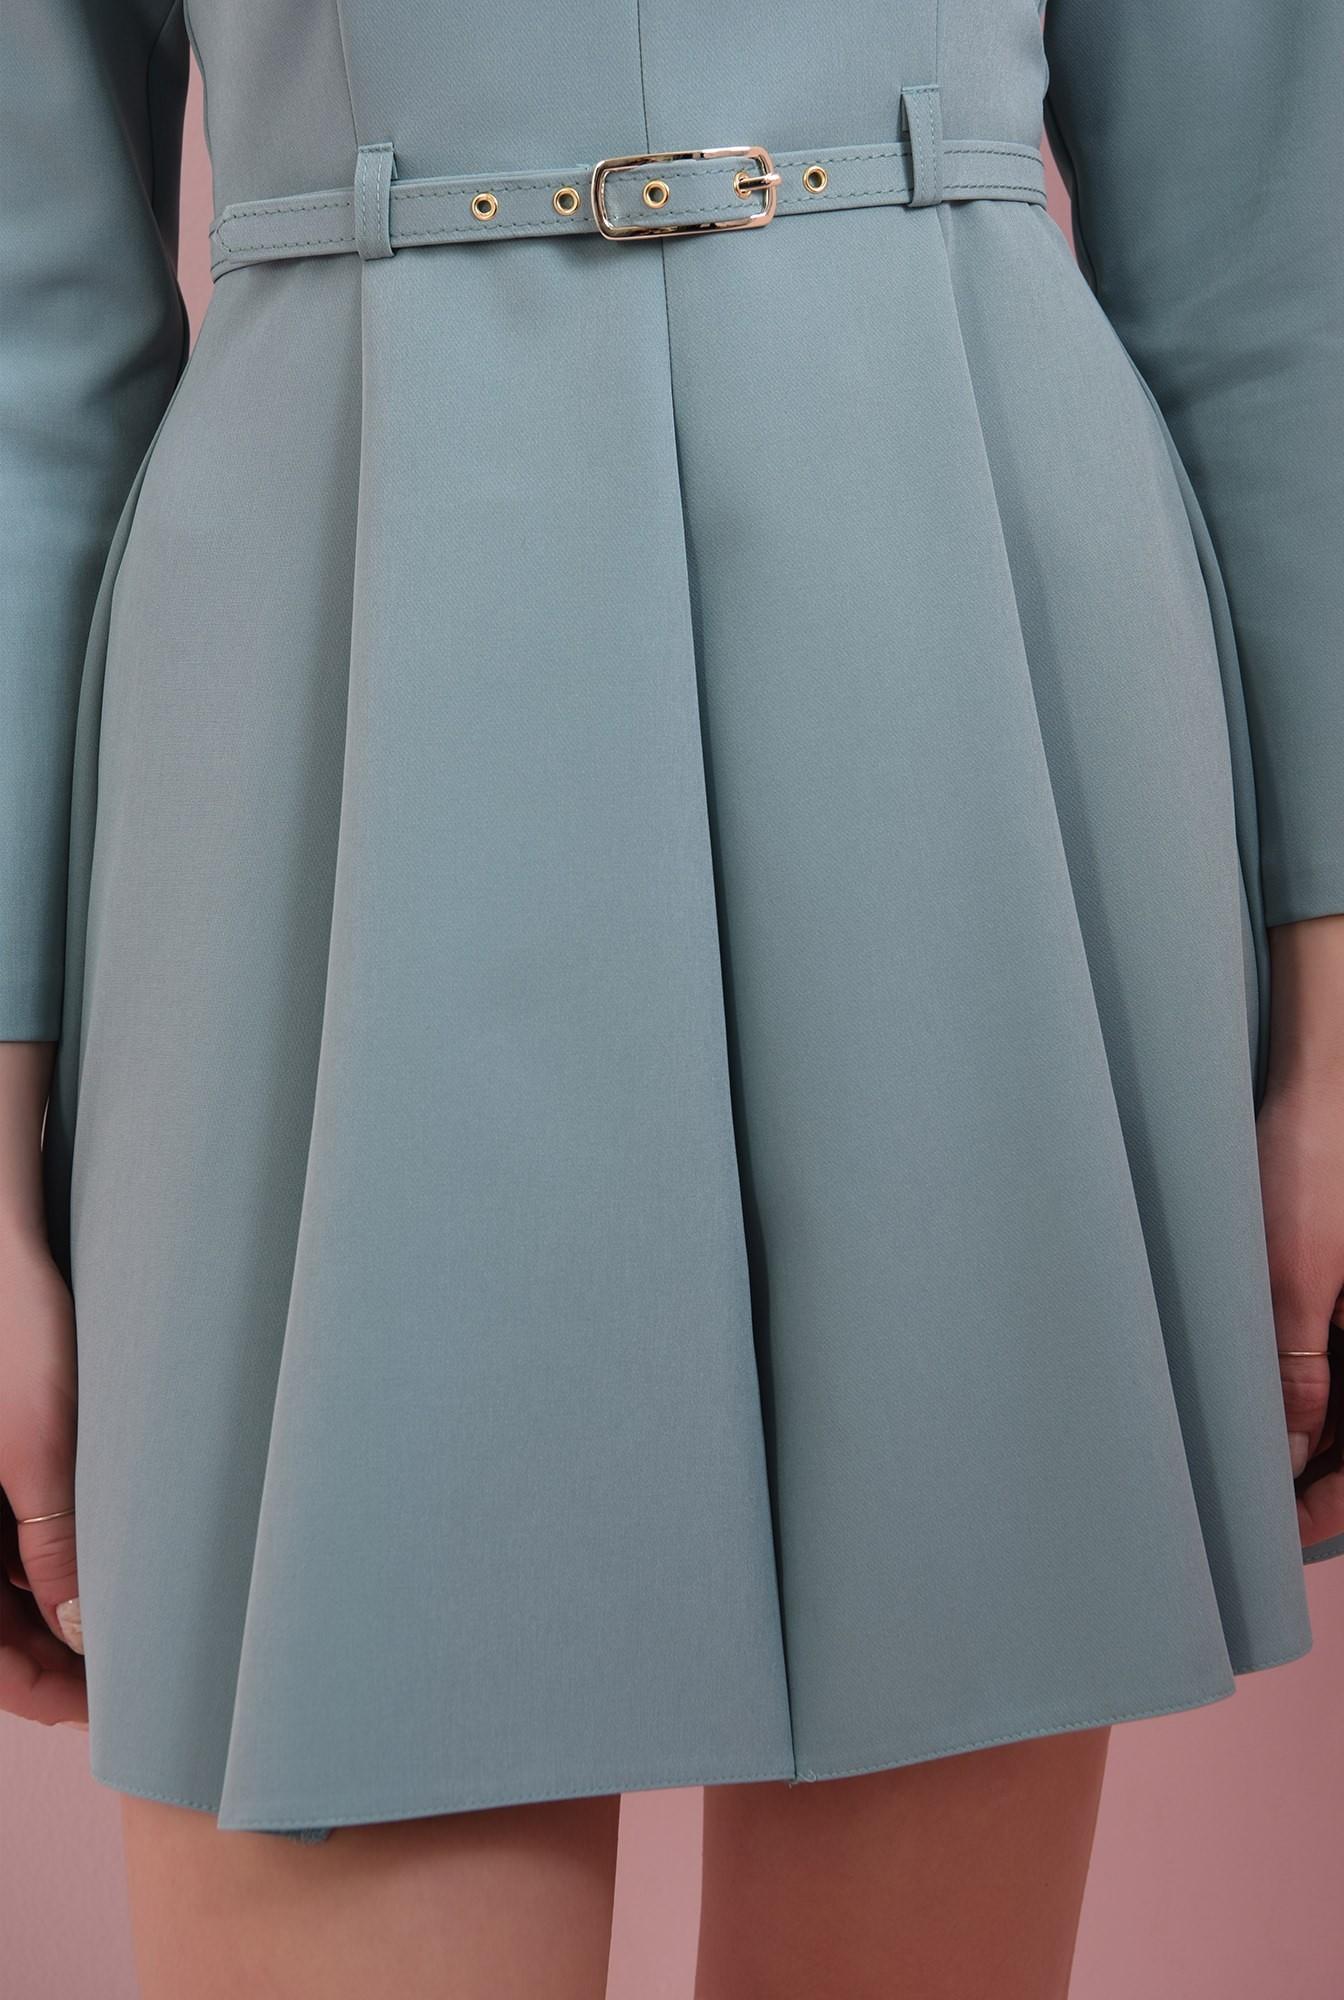 2 - rochie evazata, menta, cu umeri accentuati